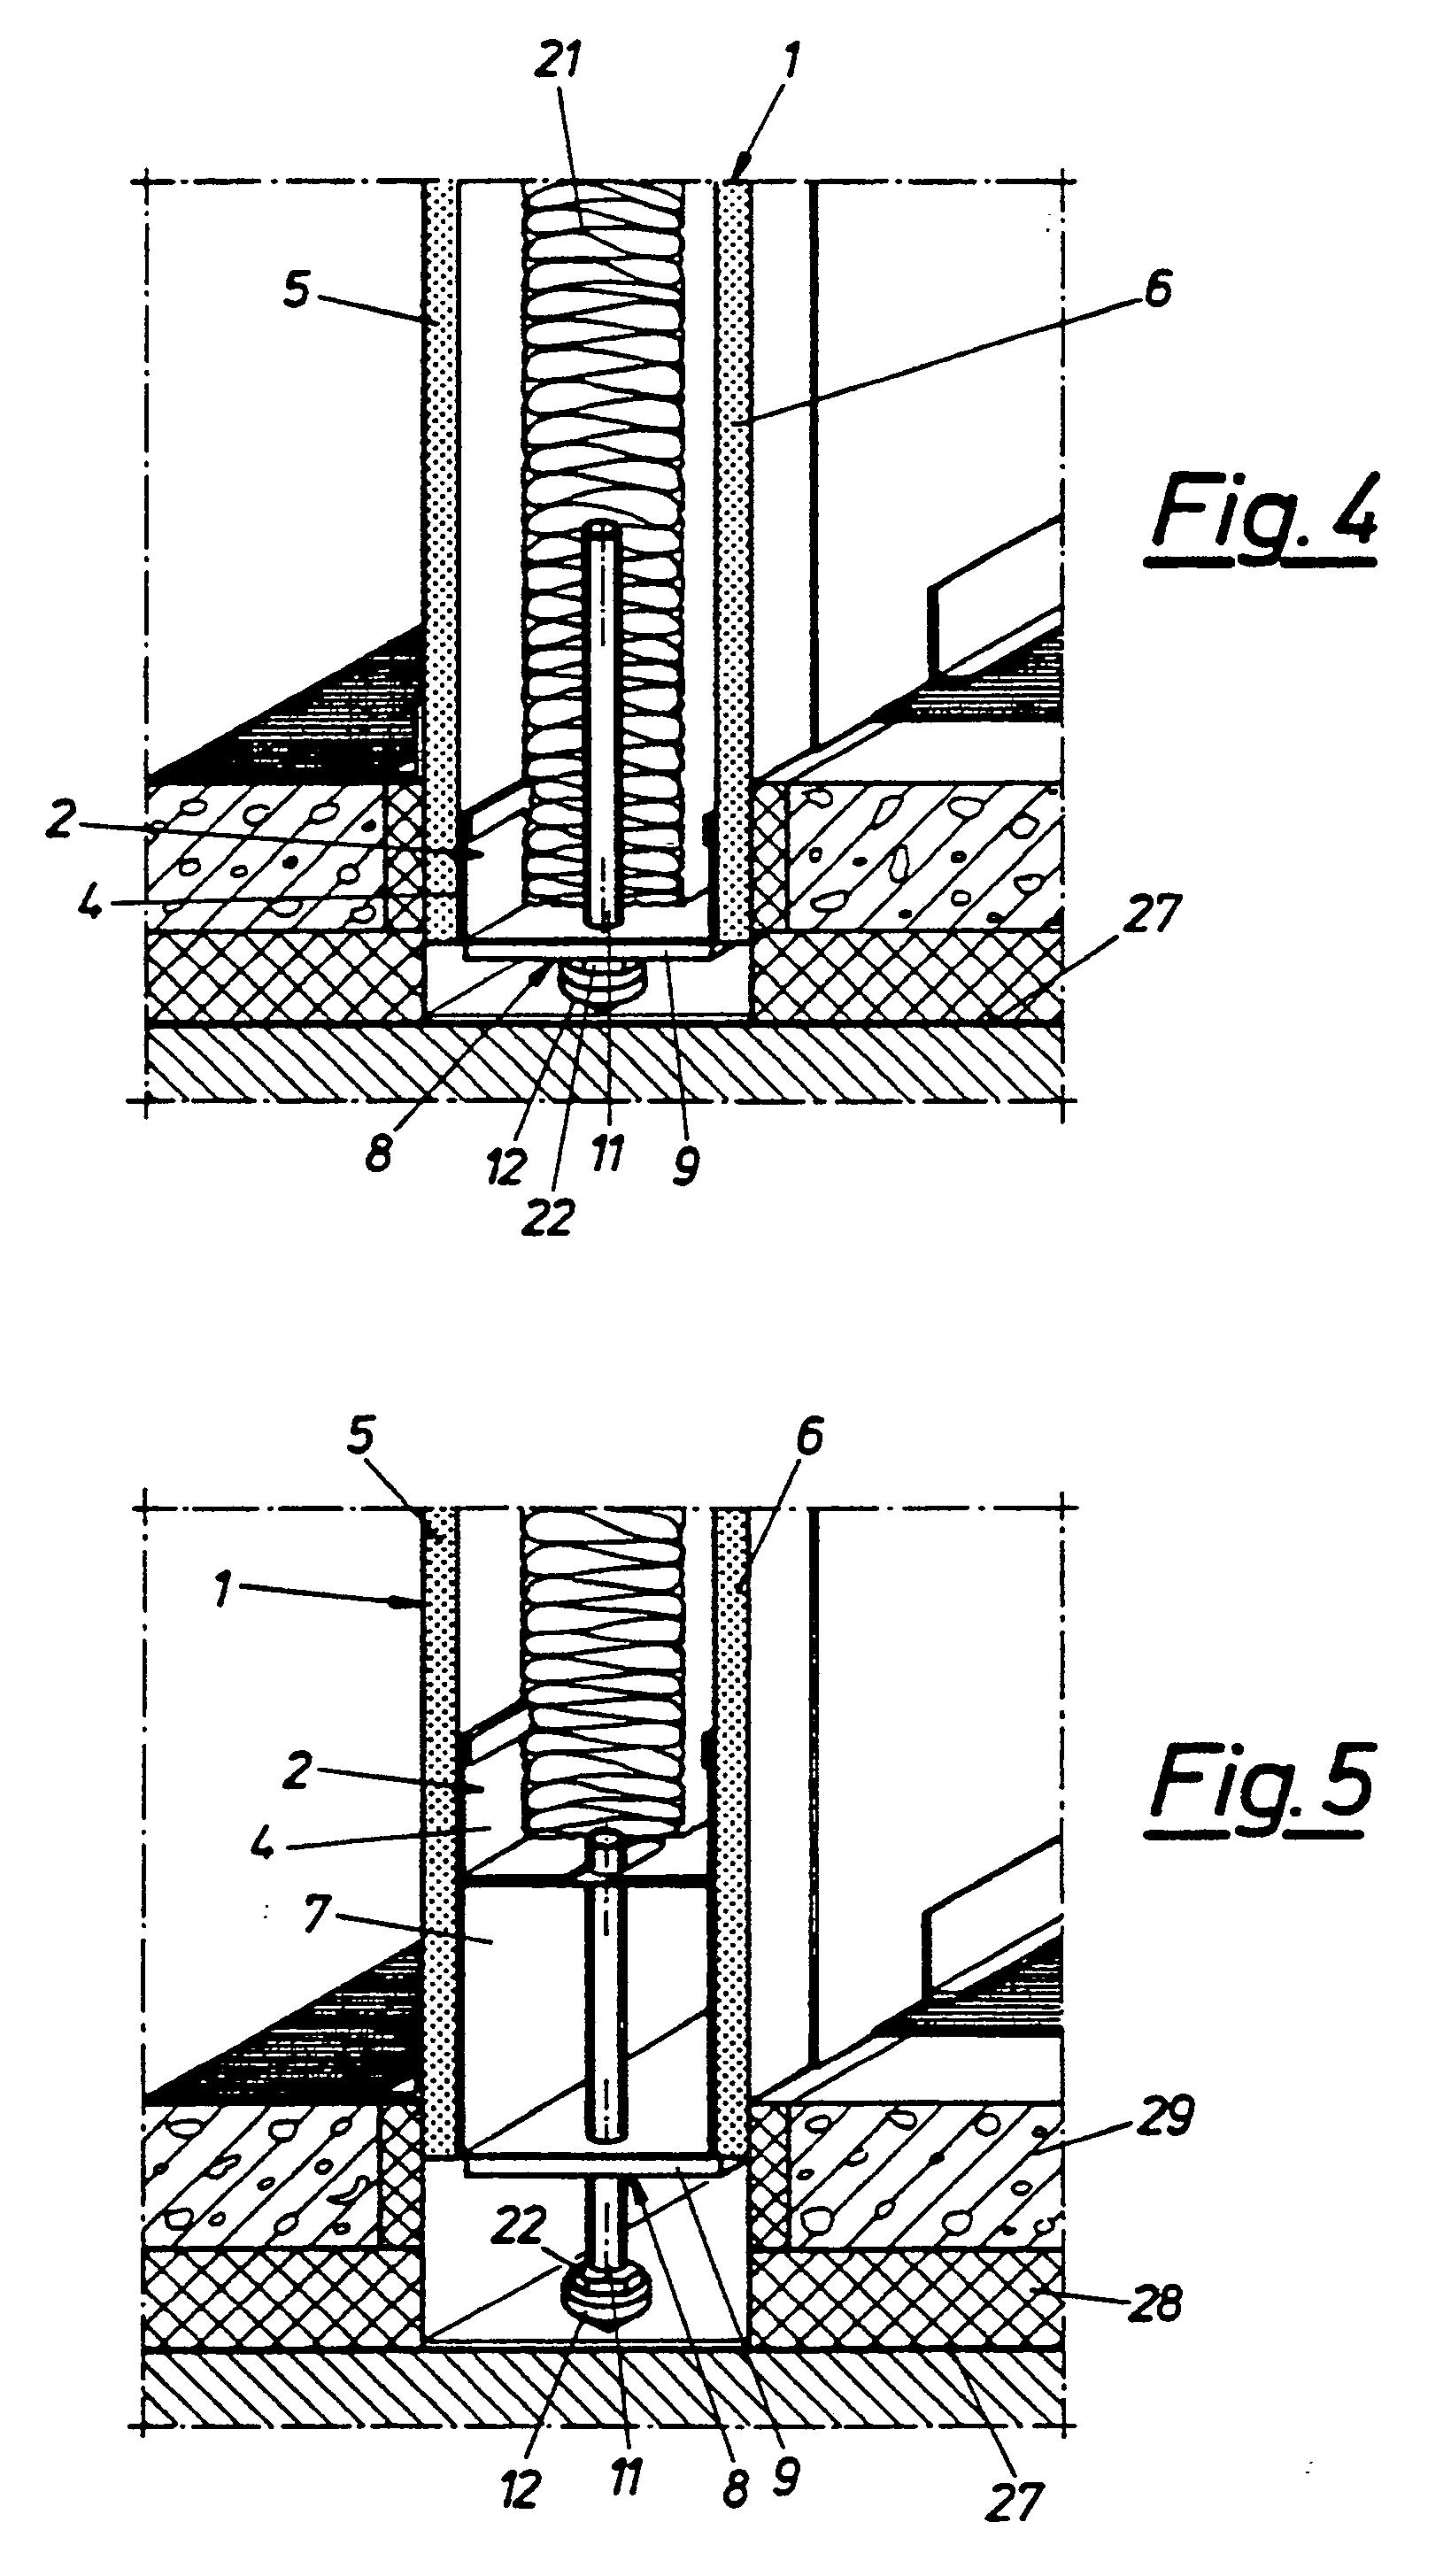 patent ep0302046b1 wandelementanordnung google patents. Black Bedroom Furniture Sets. Home Design Ideas